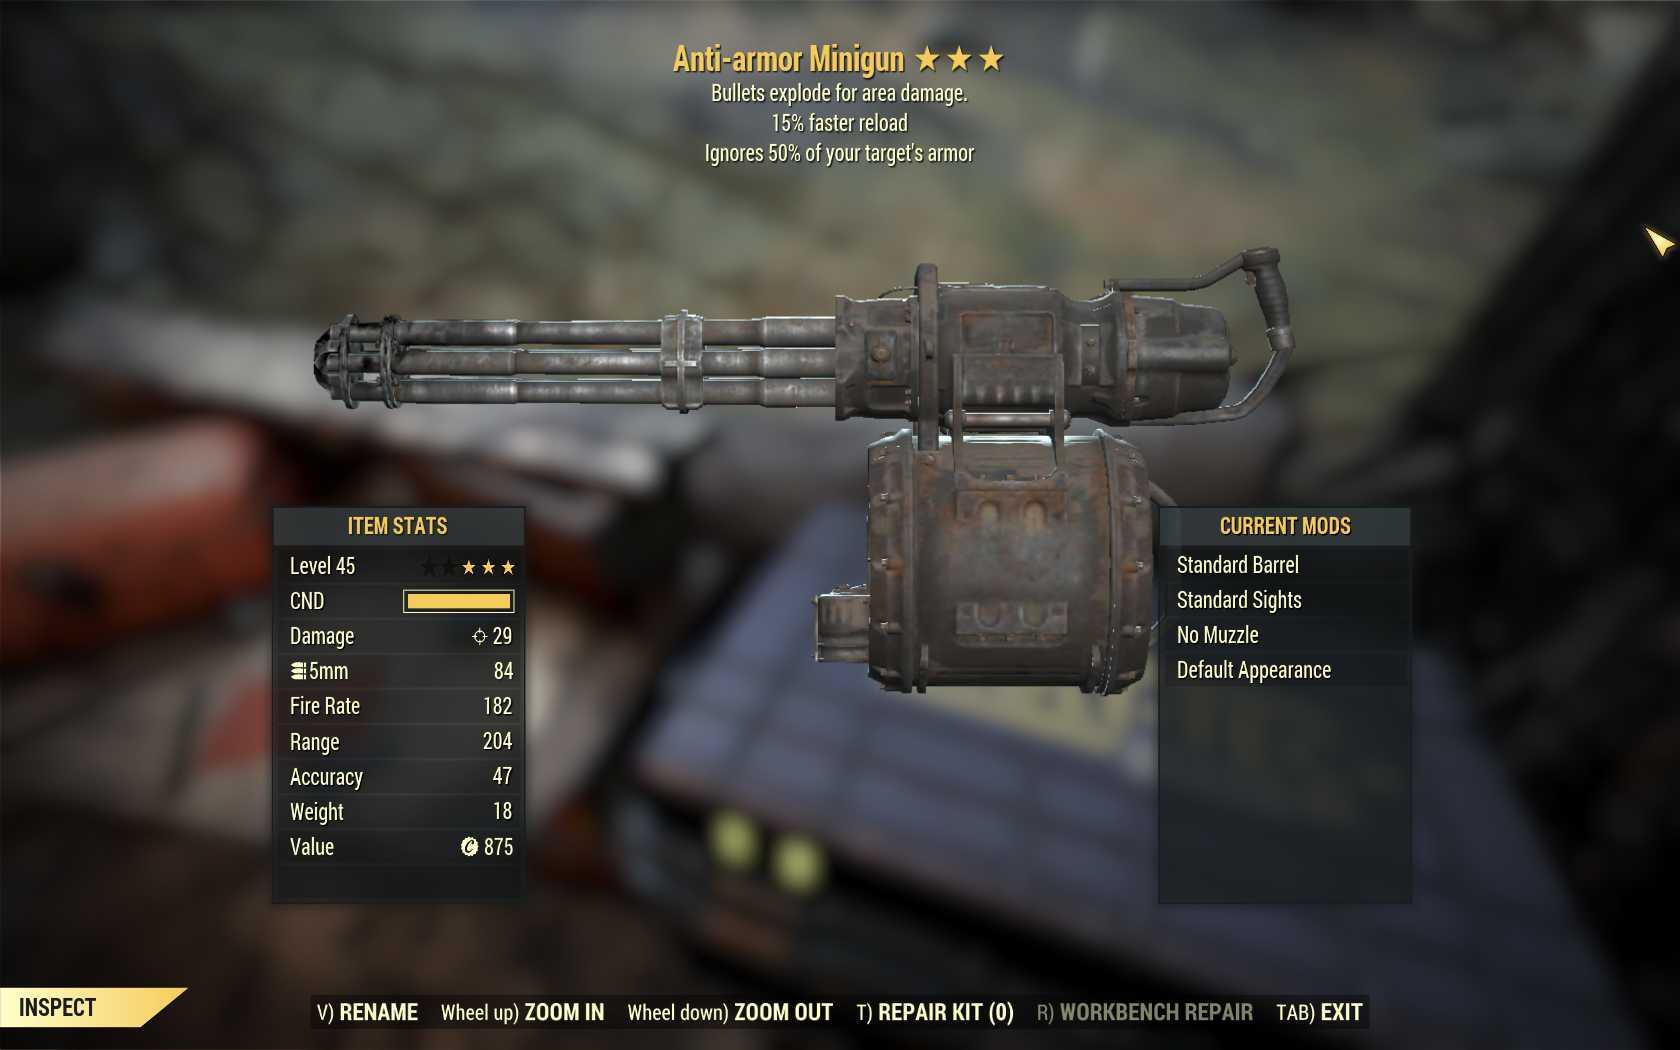 Anti-Armor Explosive Minigun (15% faster reload)